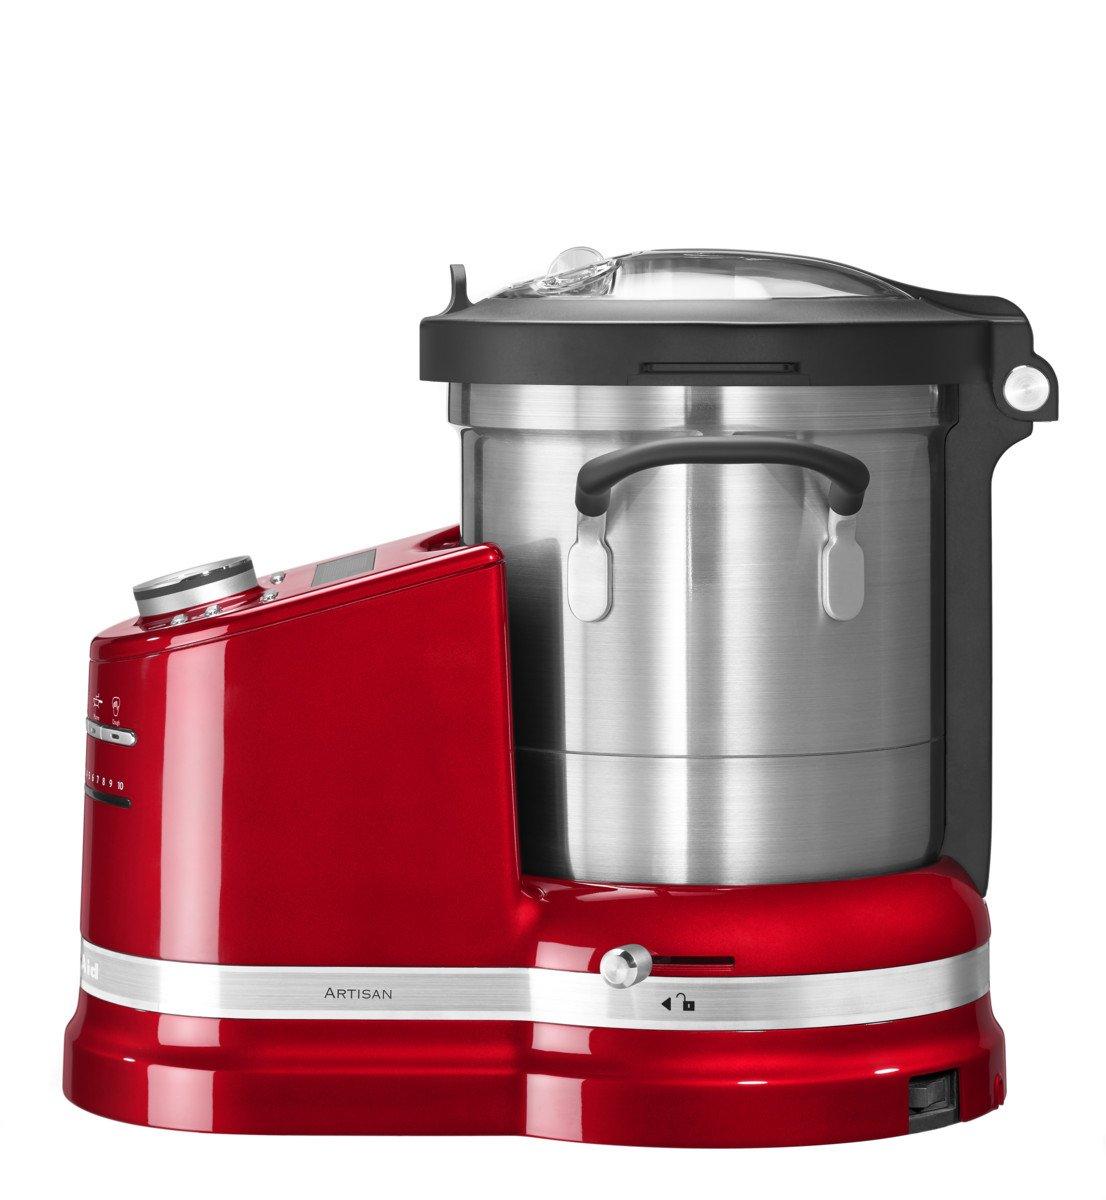 KitchenAid 5 kcf0103